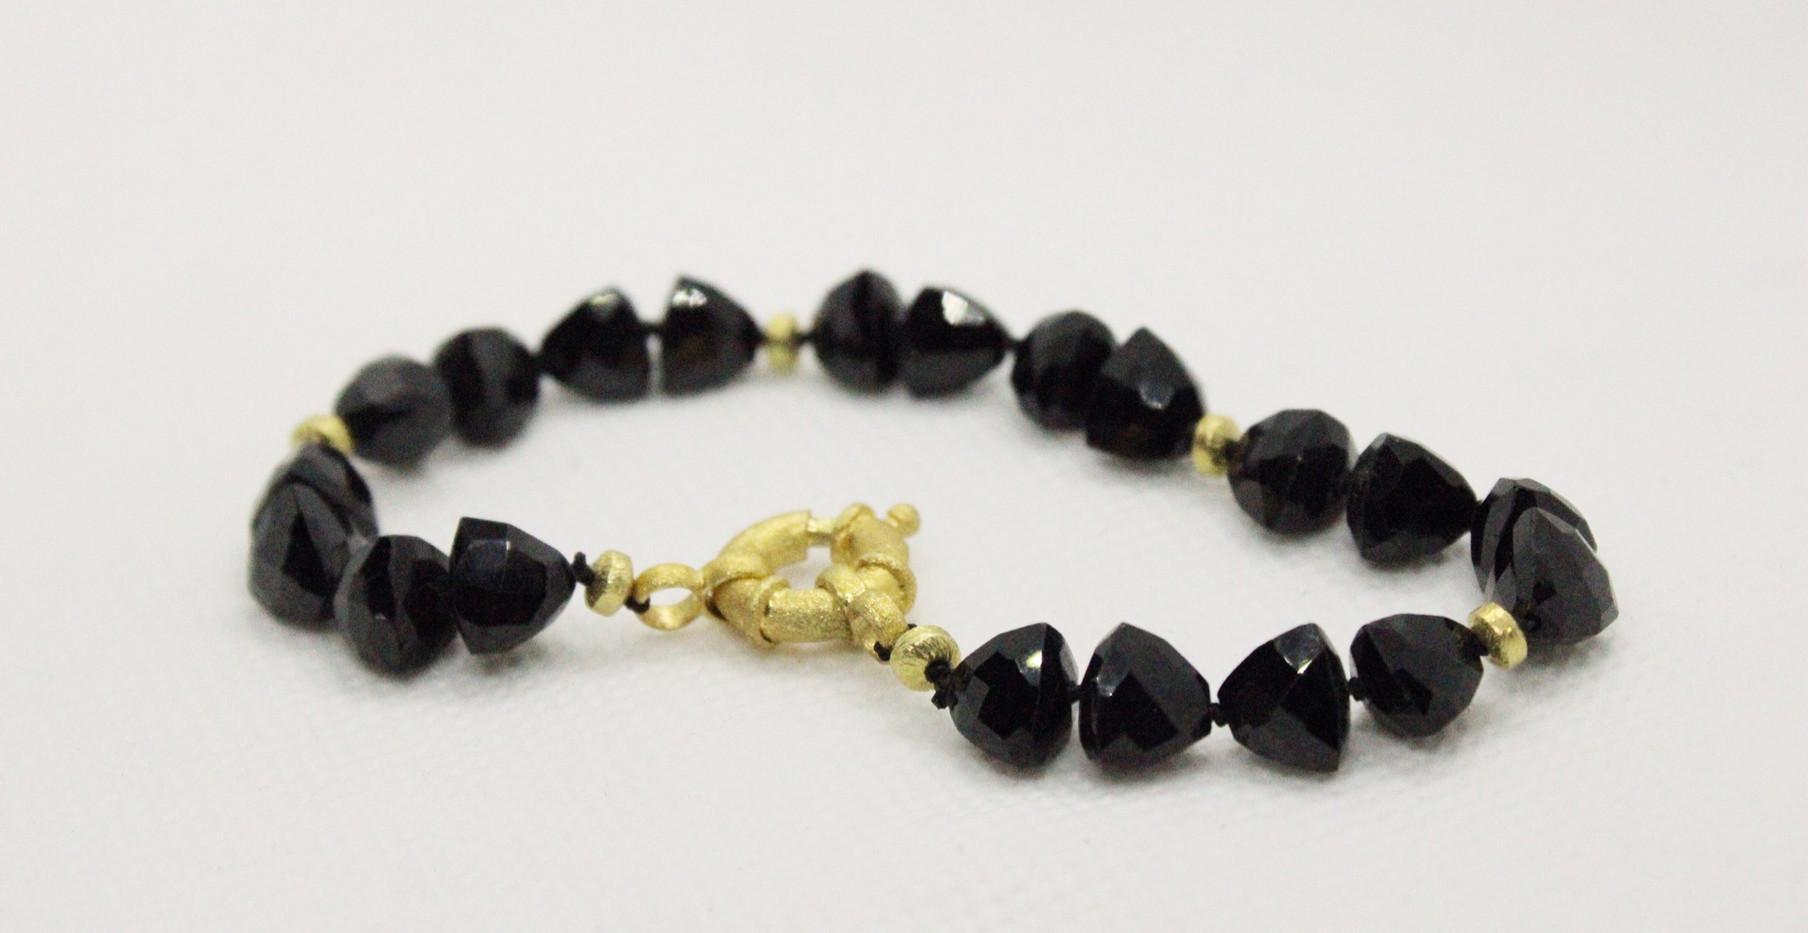 schwarzer spinell, silber vergoldet